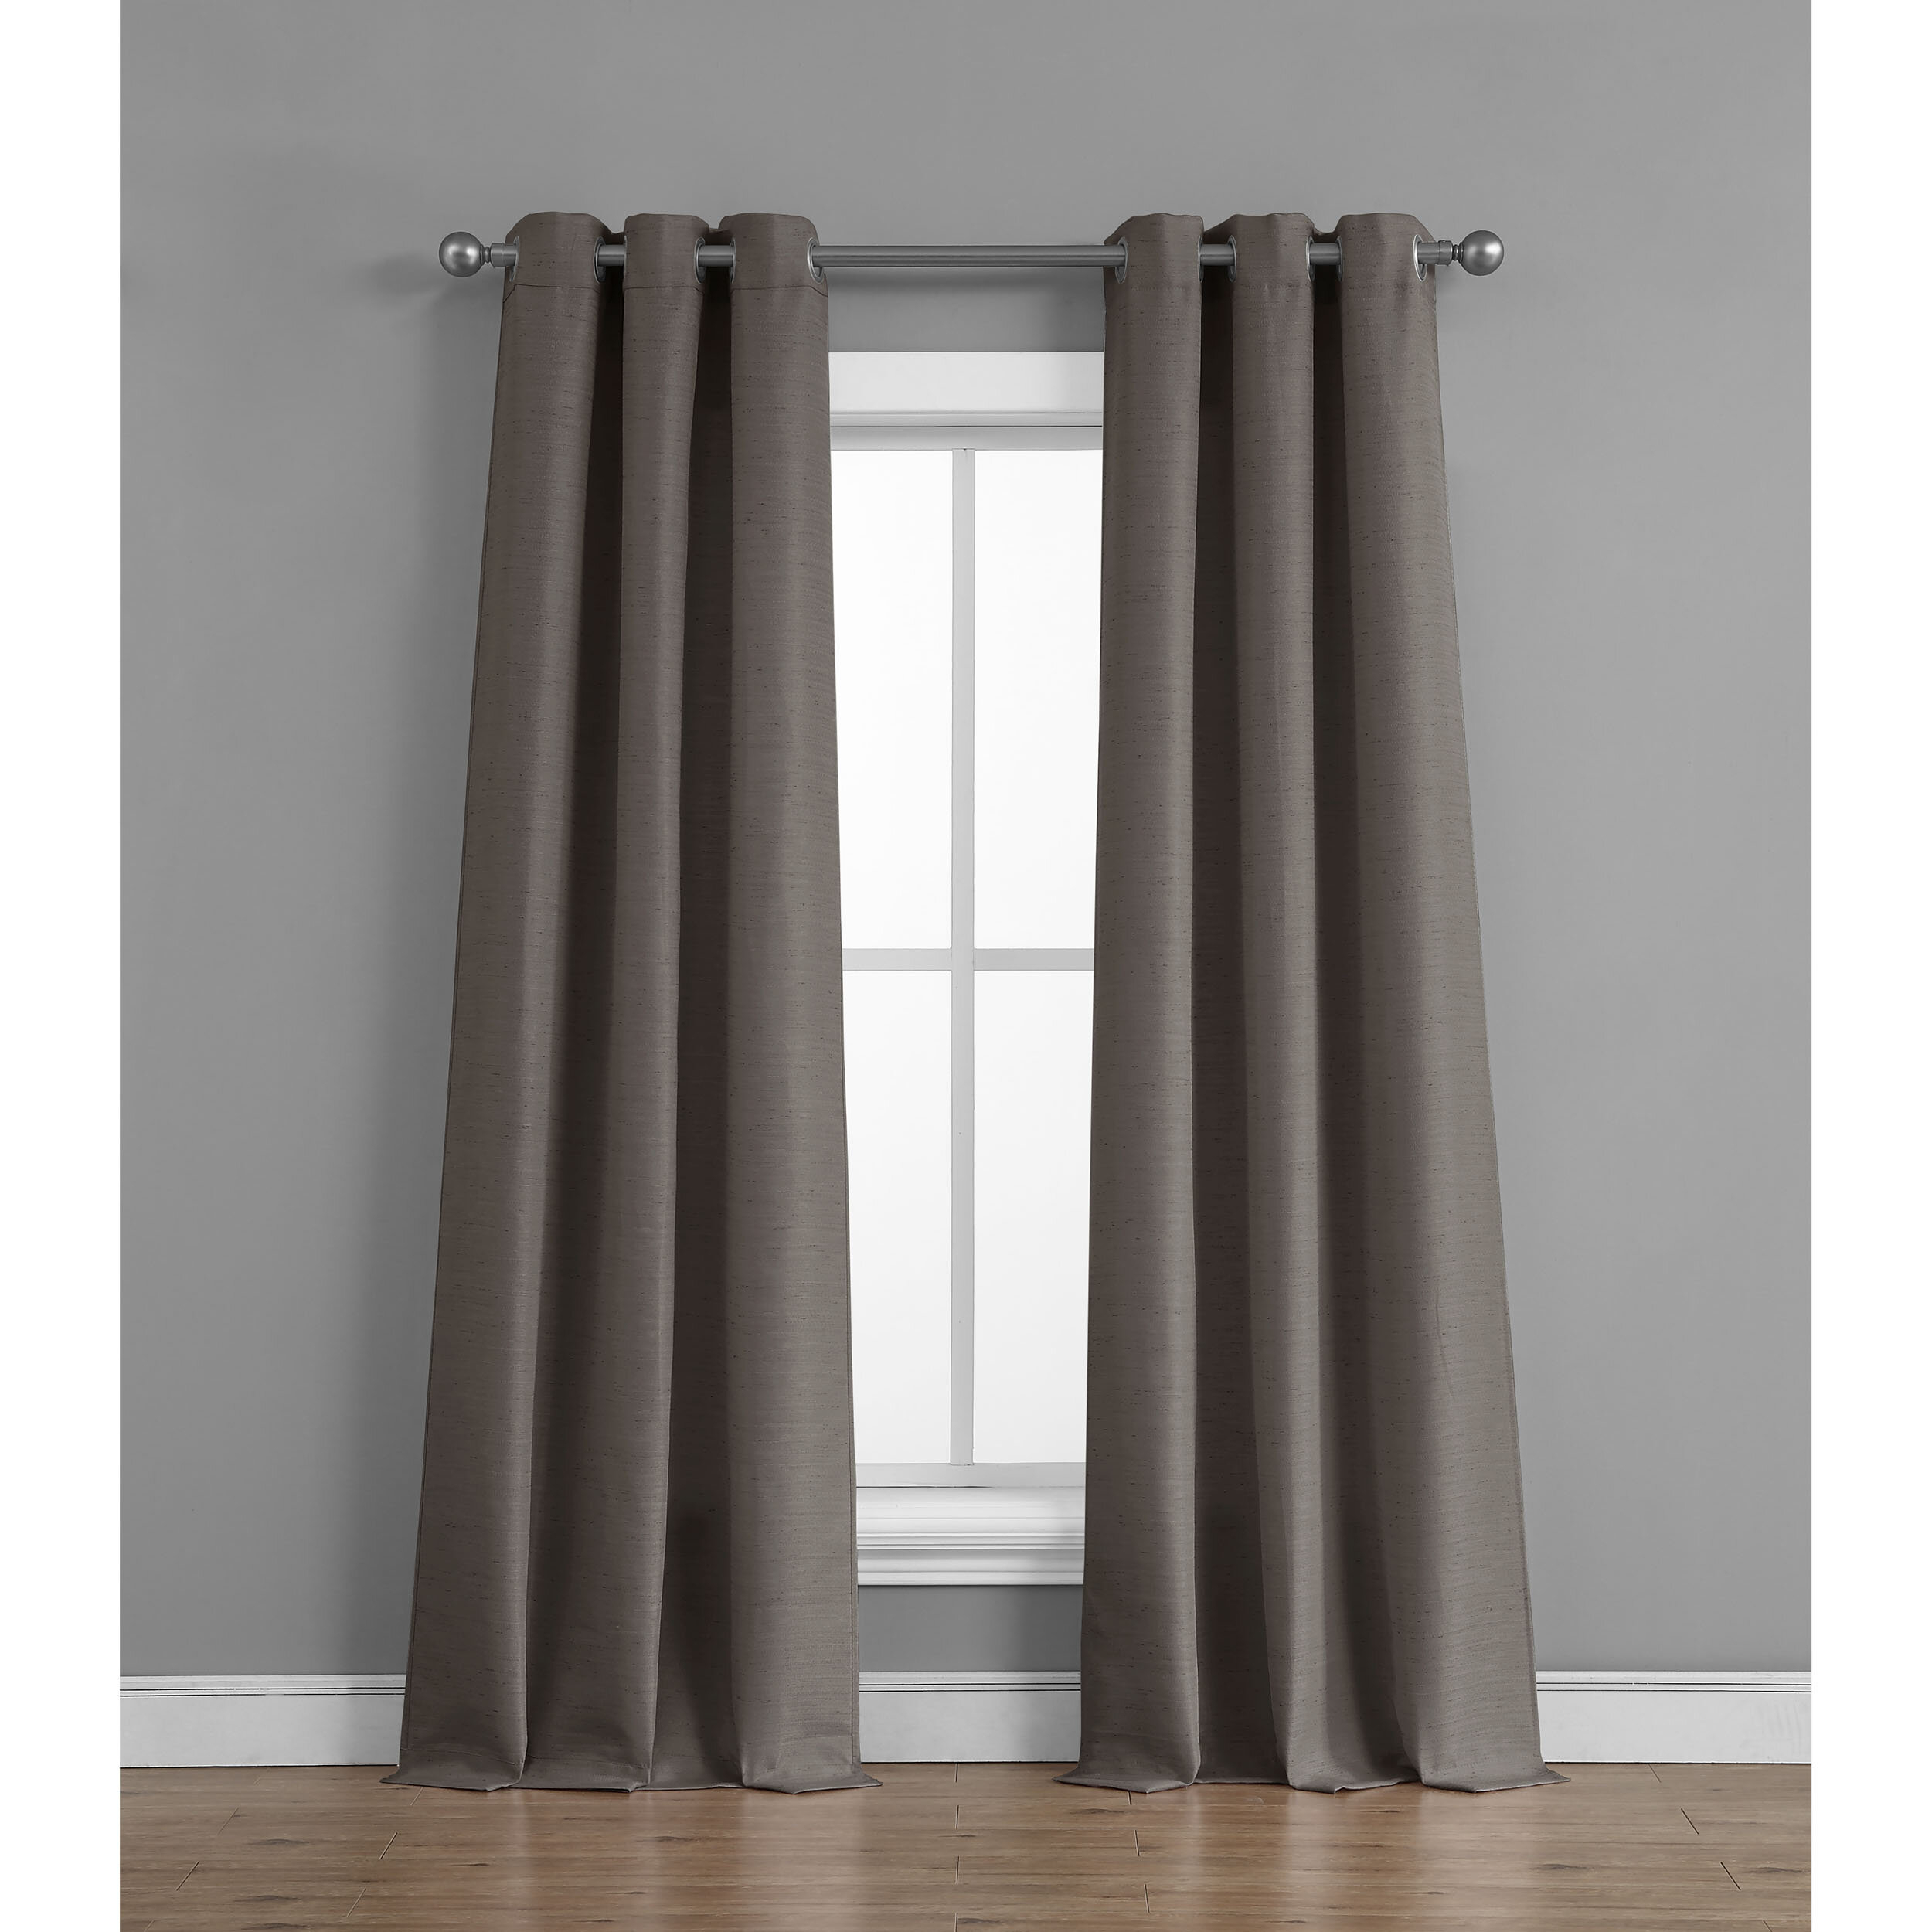 Fareham Raw Faux Silk Semi Sheer Grommet Curtain Panels Regarding Raw Silk Thermal Insulated Grommet Top Curtain Panel Pairs (View 12 of 20)